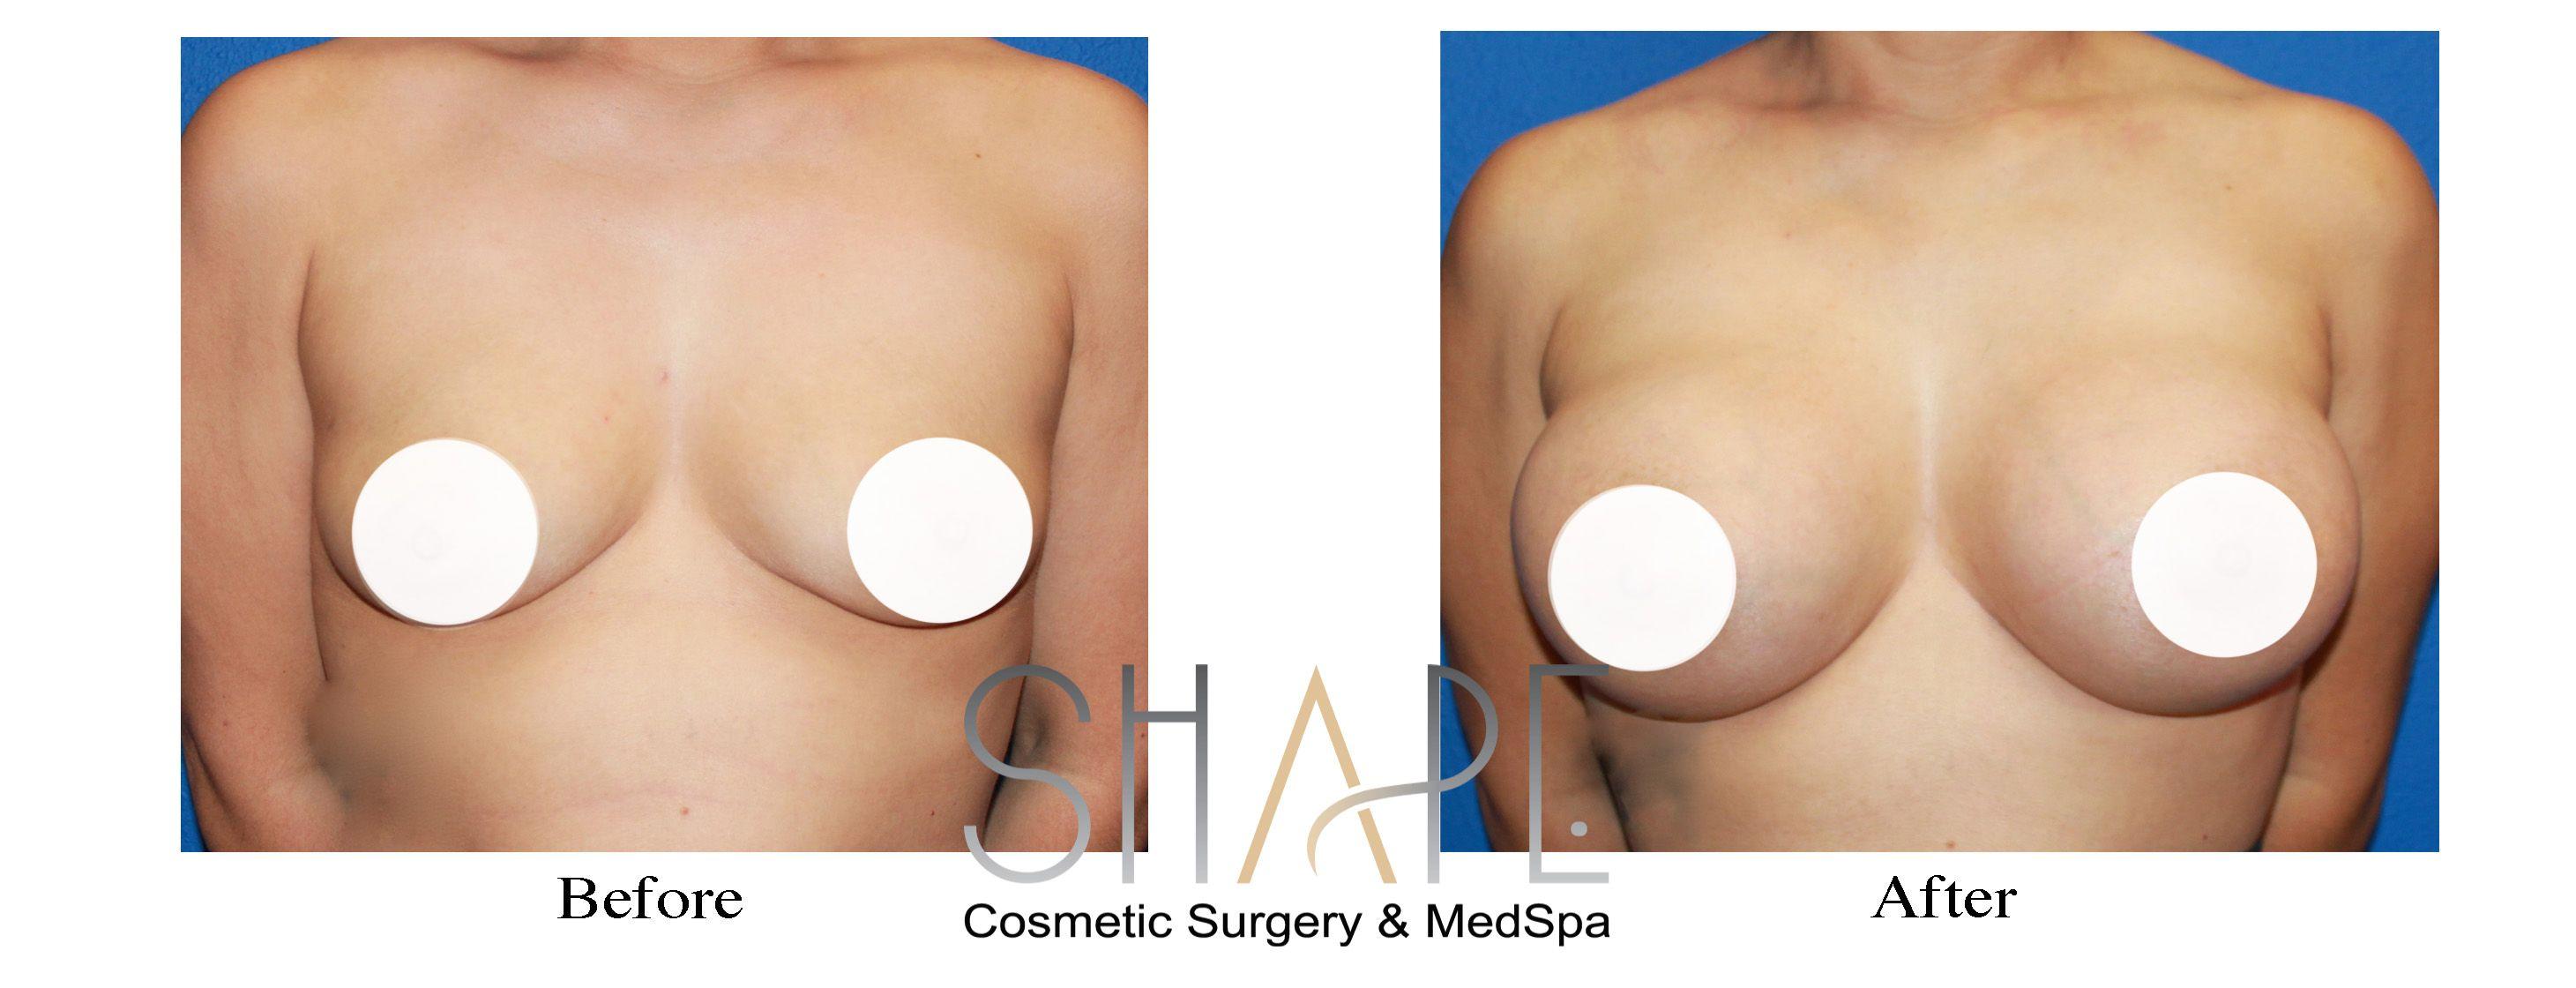 augmentation spokane wa breast